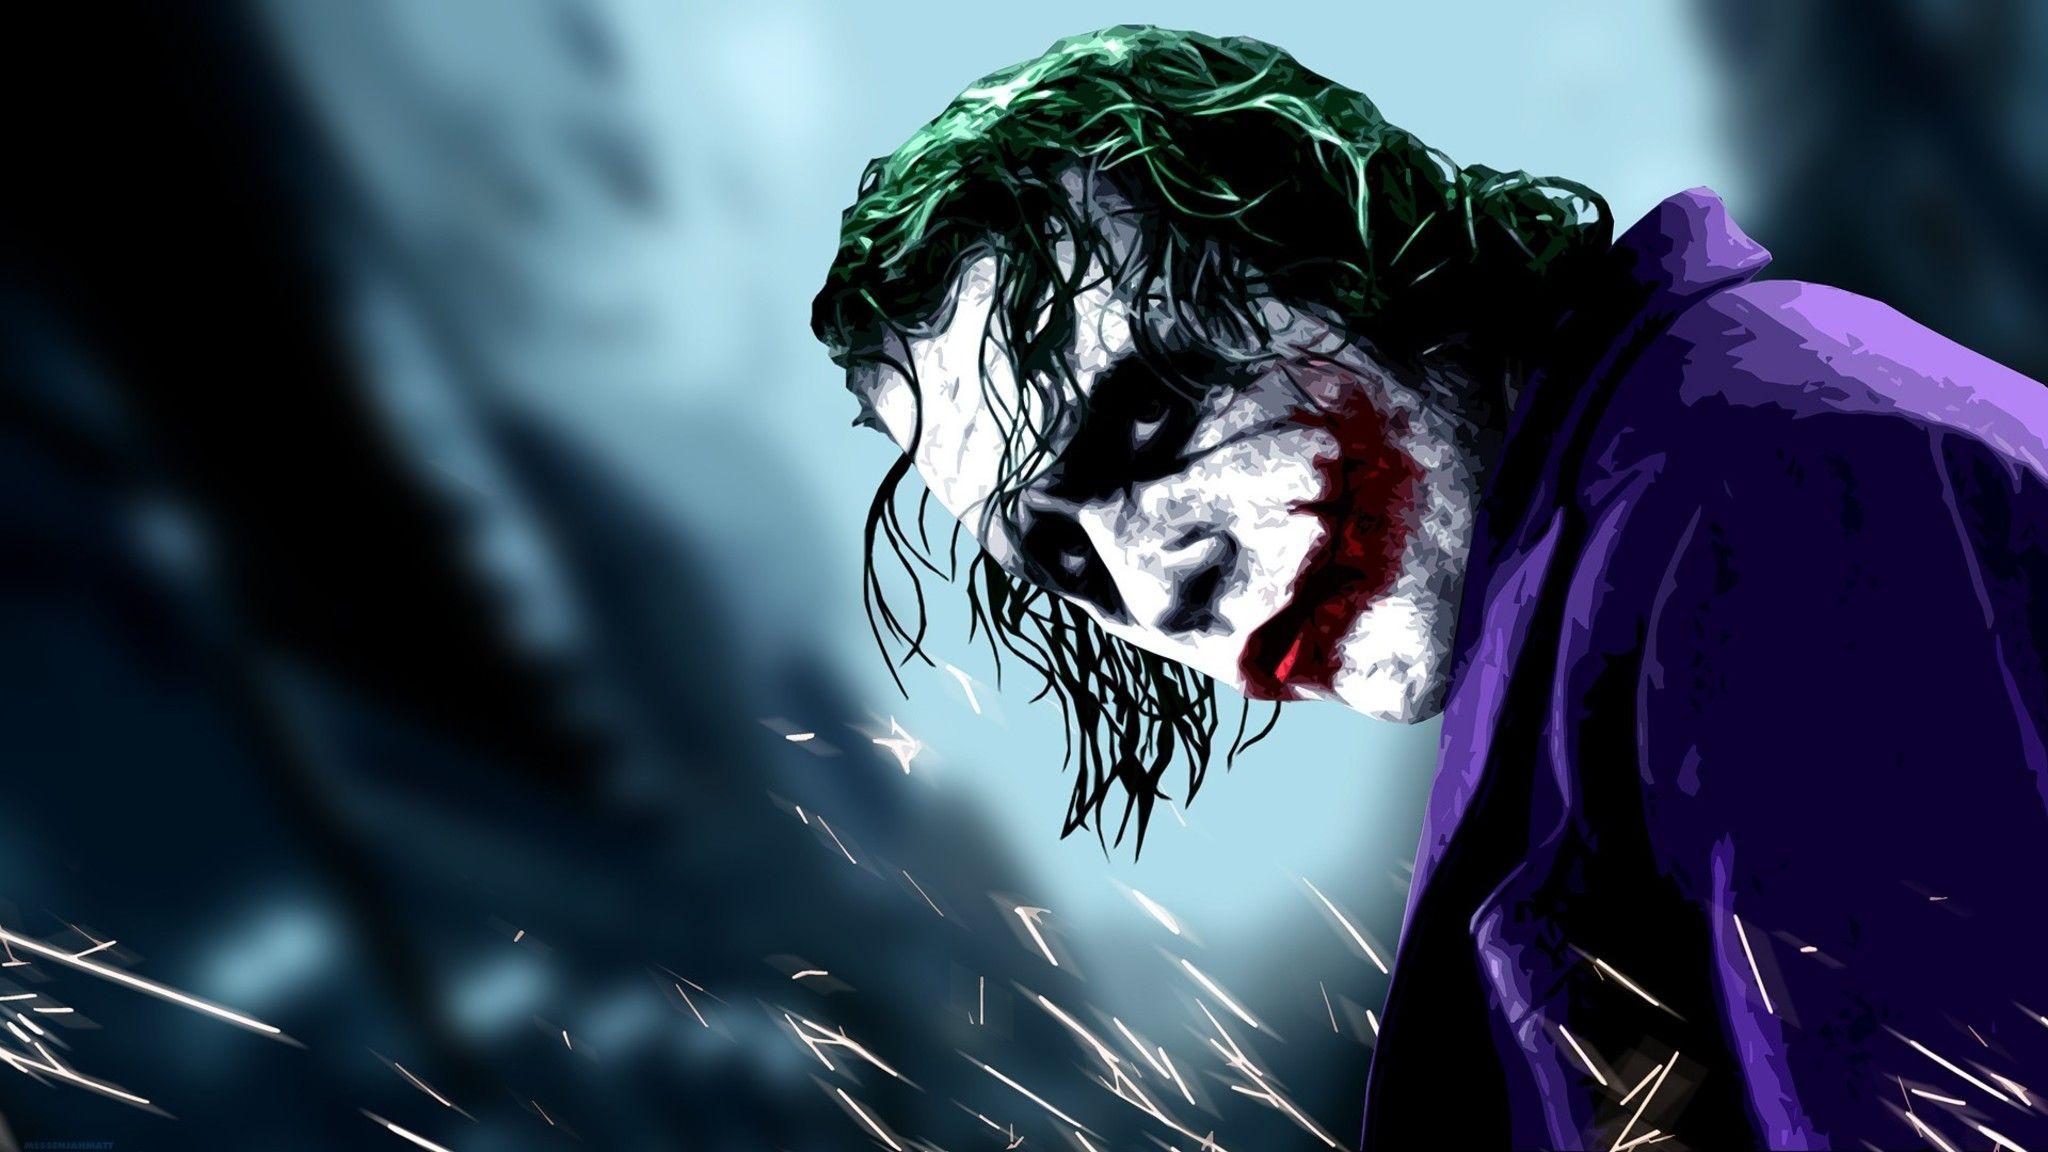 Fondo de pantalla Joker